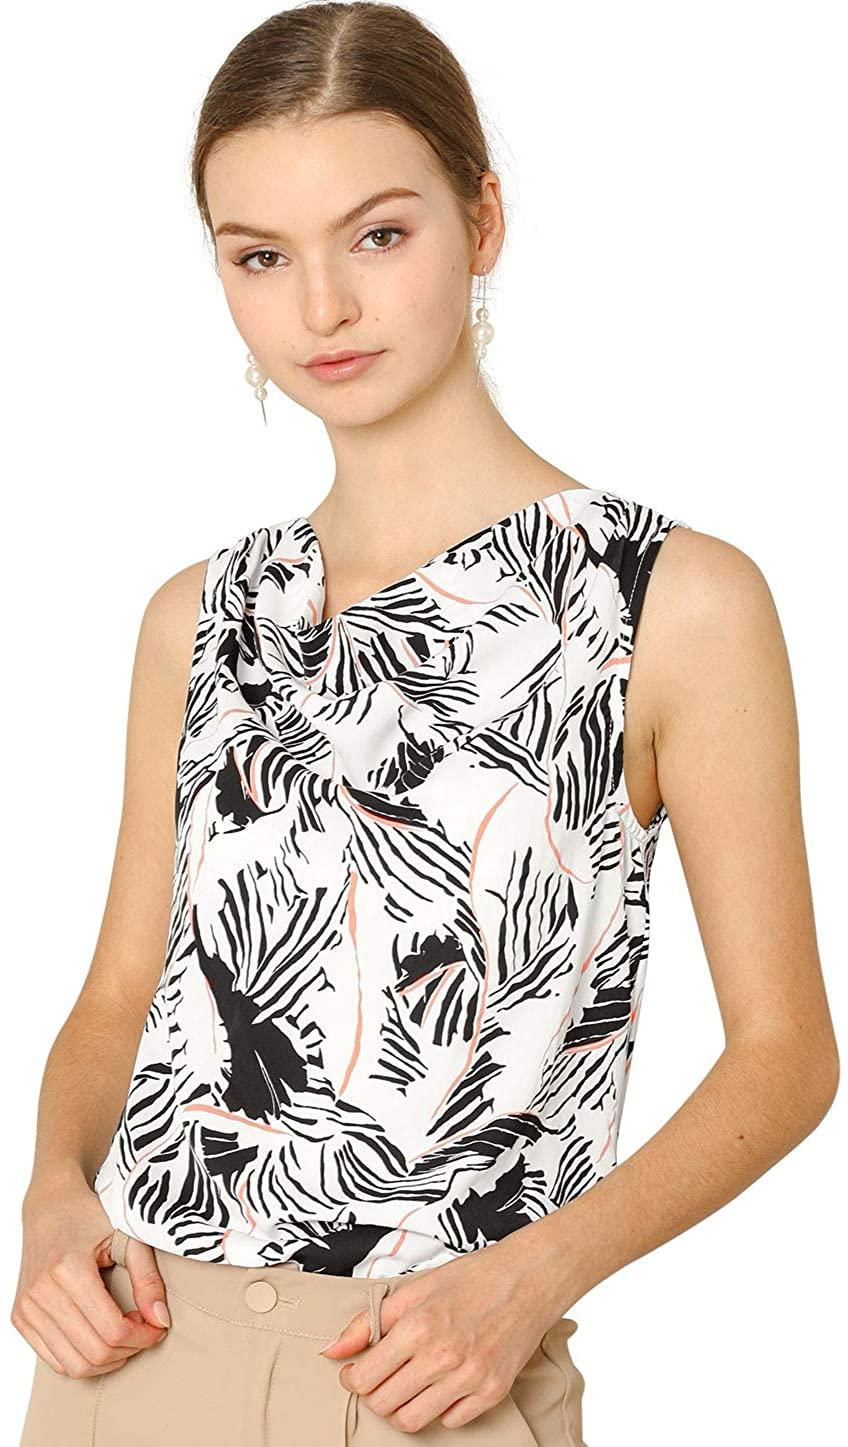 Allegra K Women's Summer Abstract Floral PrintCowl Neck Sleeveless Blouse Top